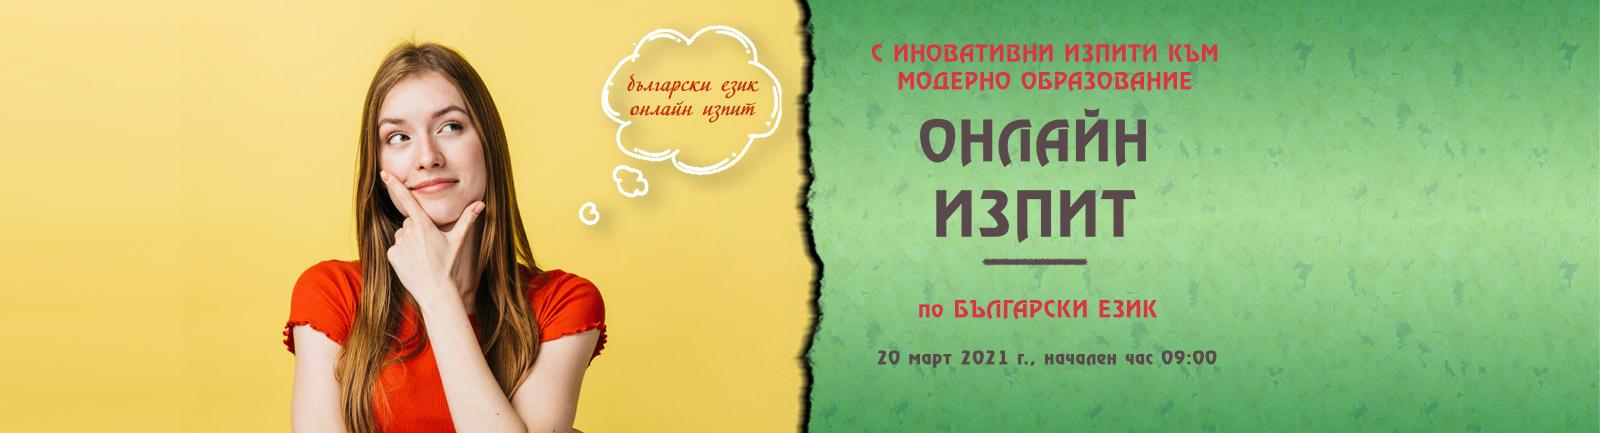 onlain-izpit-balgarski-20032021